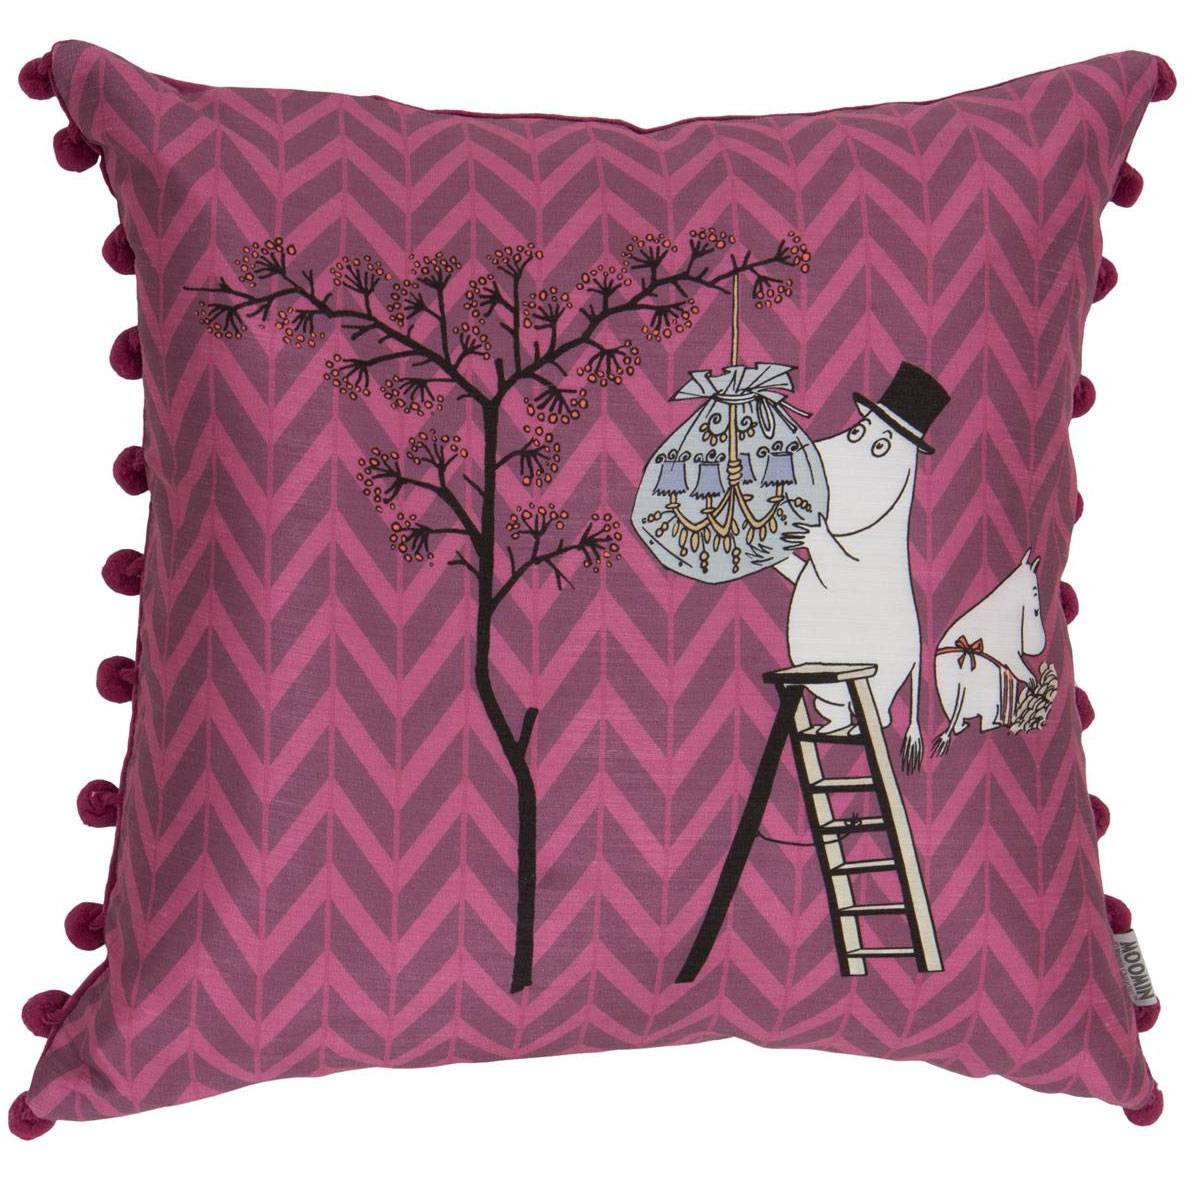 Moomin Moomin Dad Decorates the Tree Cushion Cover 50x50 cm, Aubergine